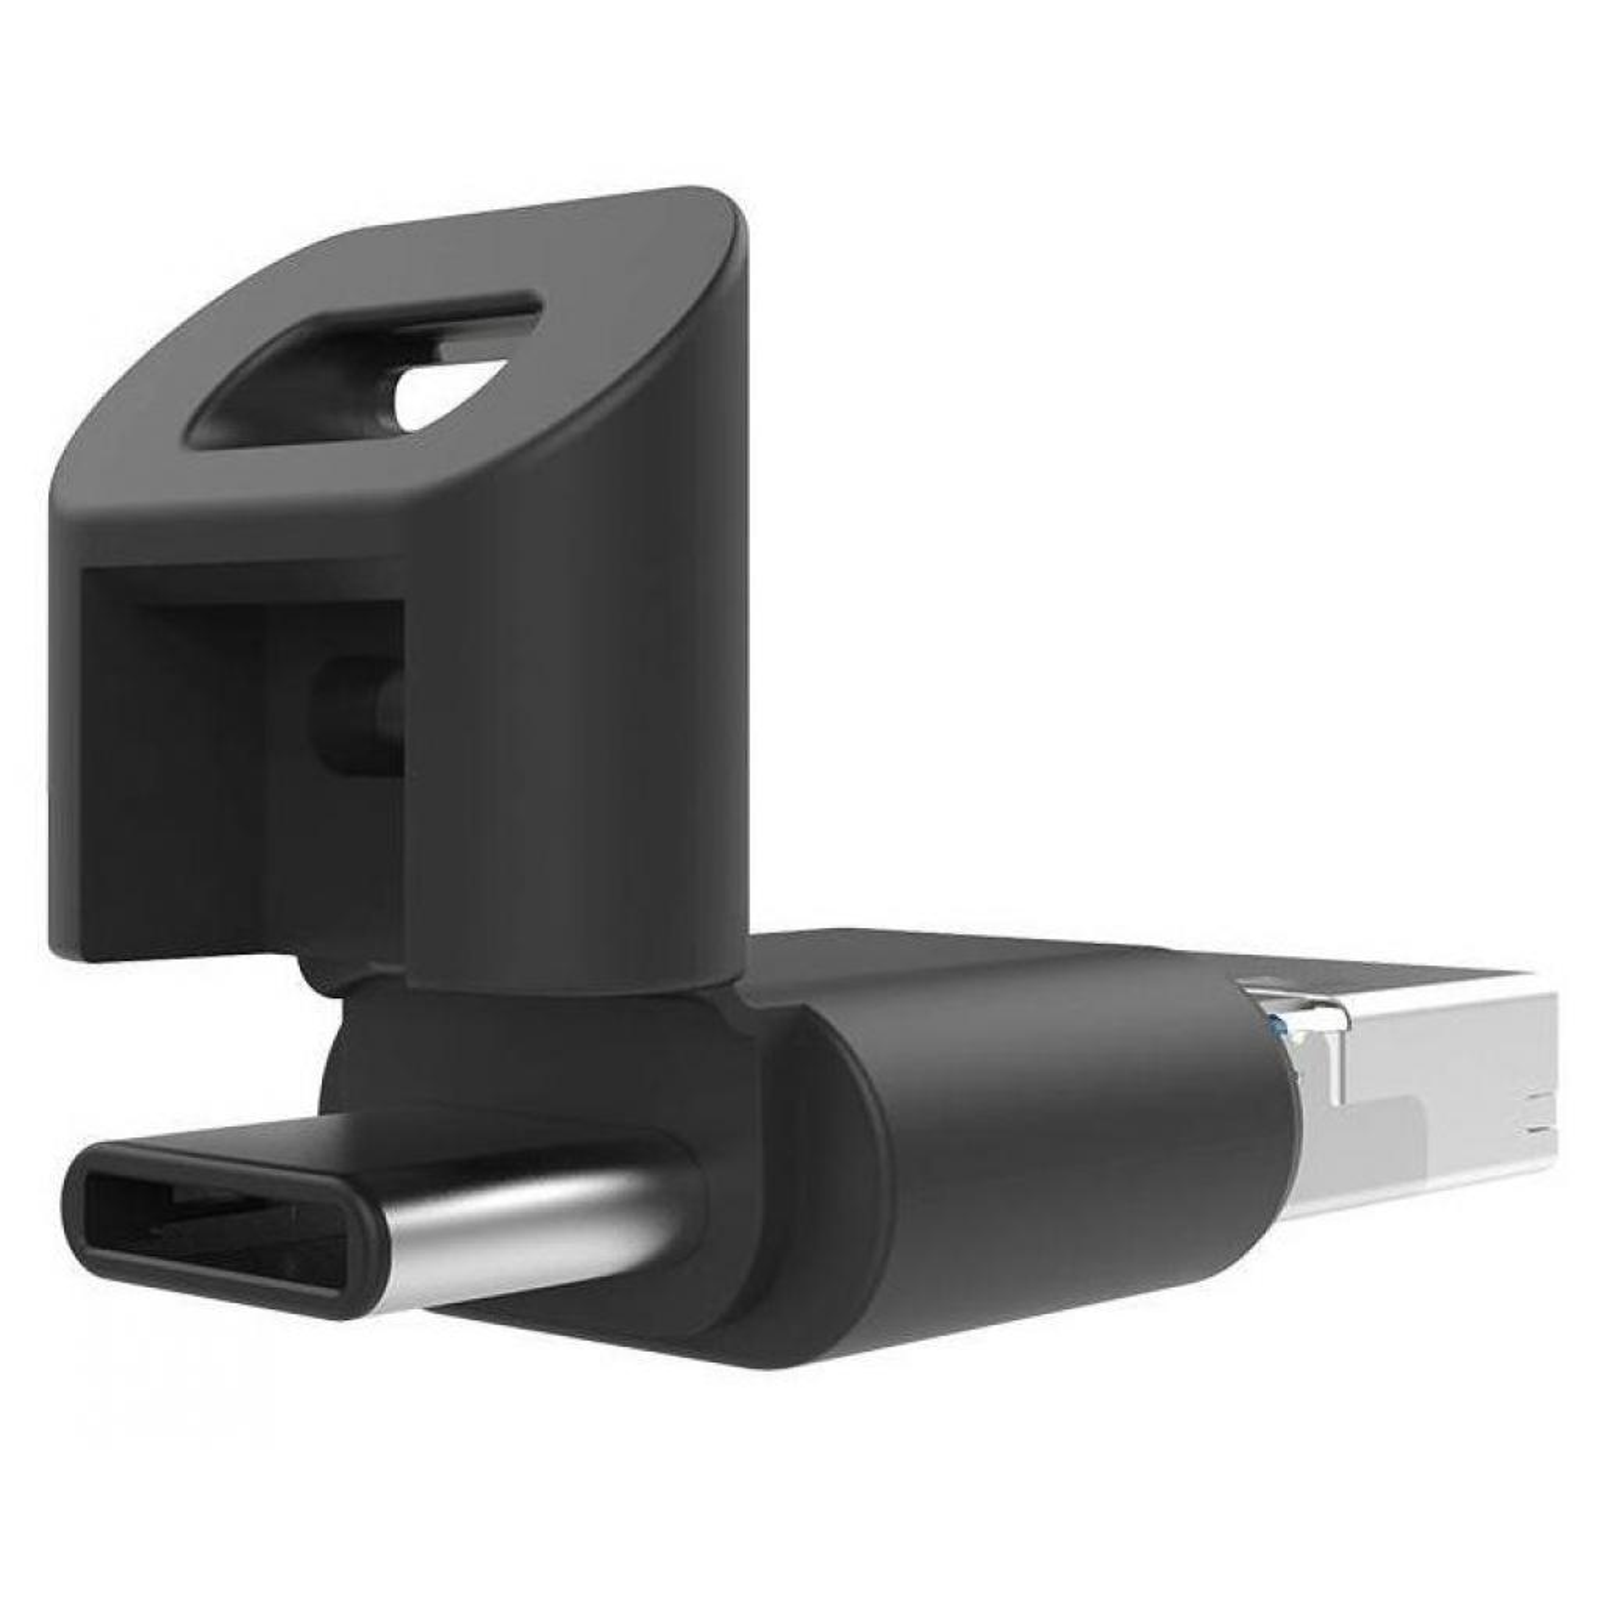 USB флеш накопитель Silicon Power 32GB Mobile C USB 3.1 / Type-C / microUSB (SP032GBUC3C50V1K) изображение 5